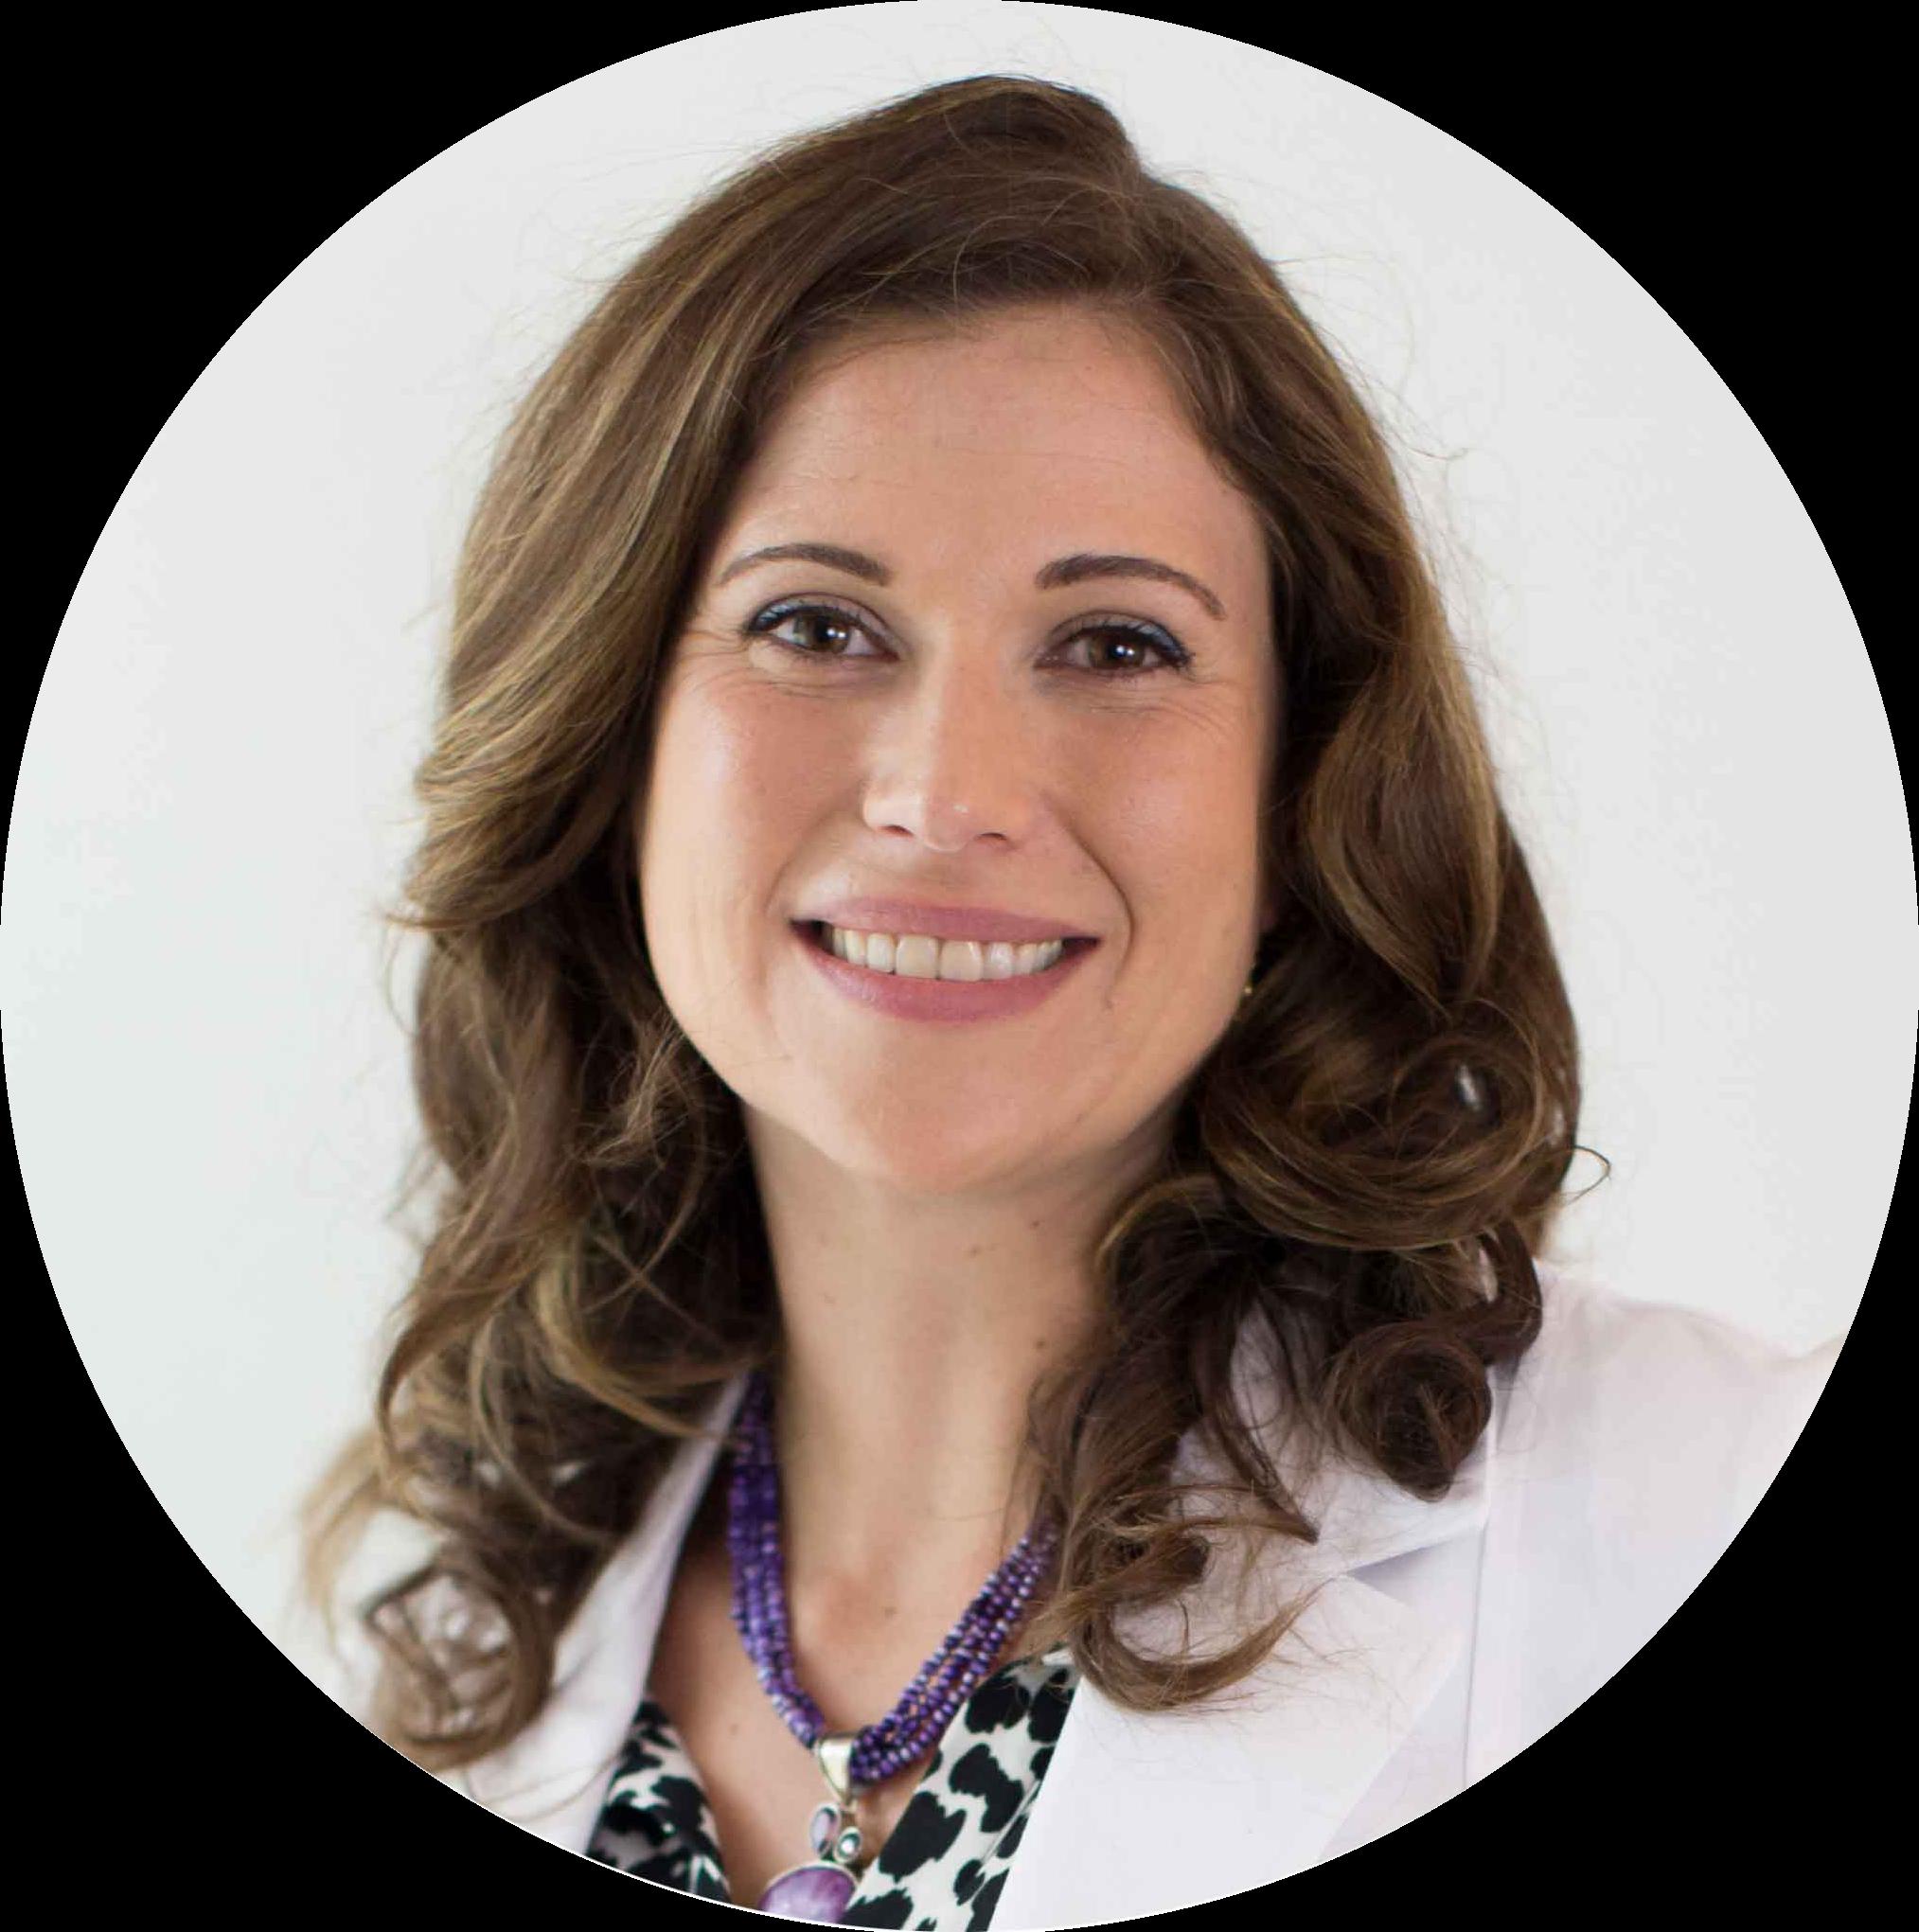 Dr Sarah Ballantyne